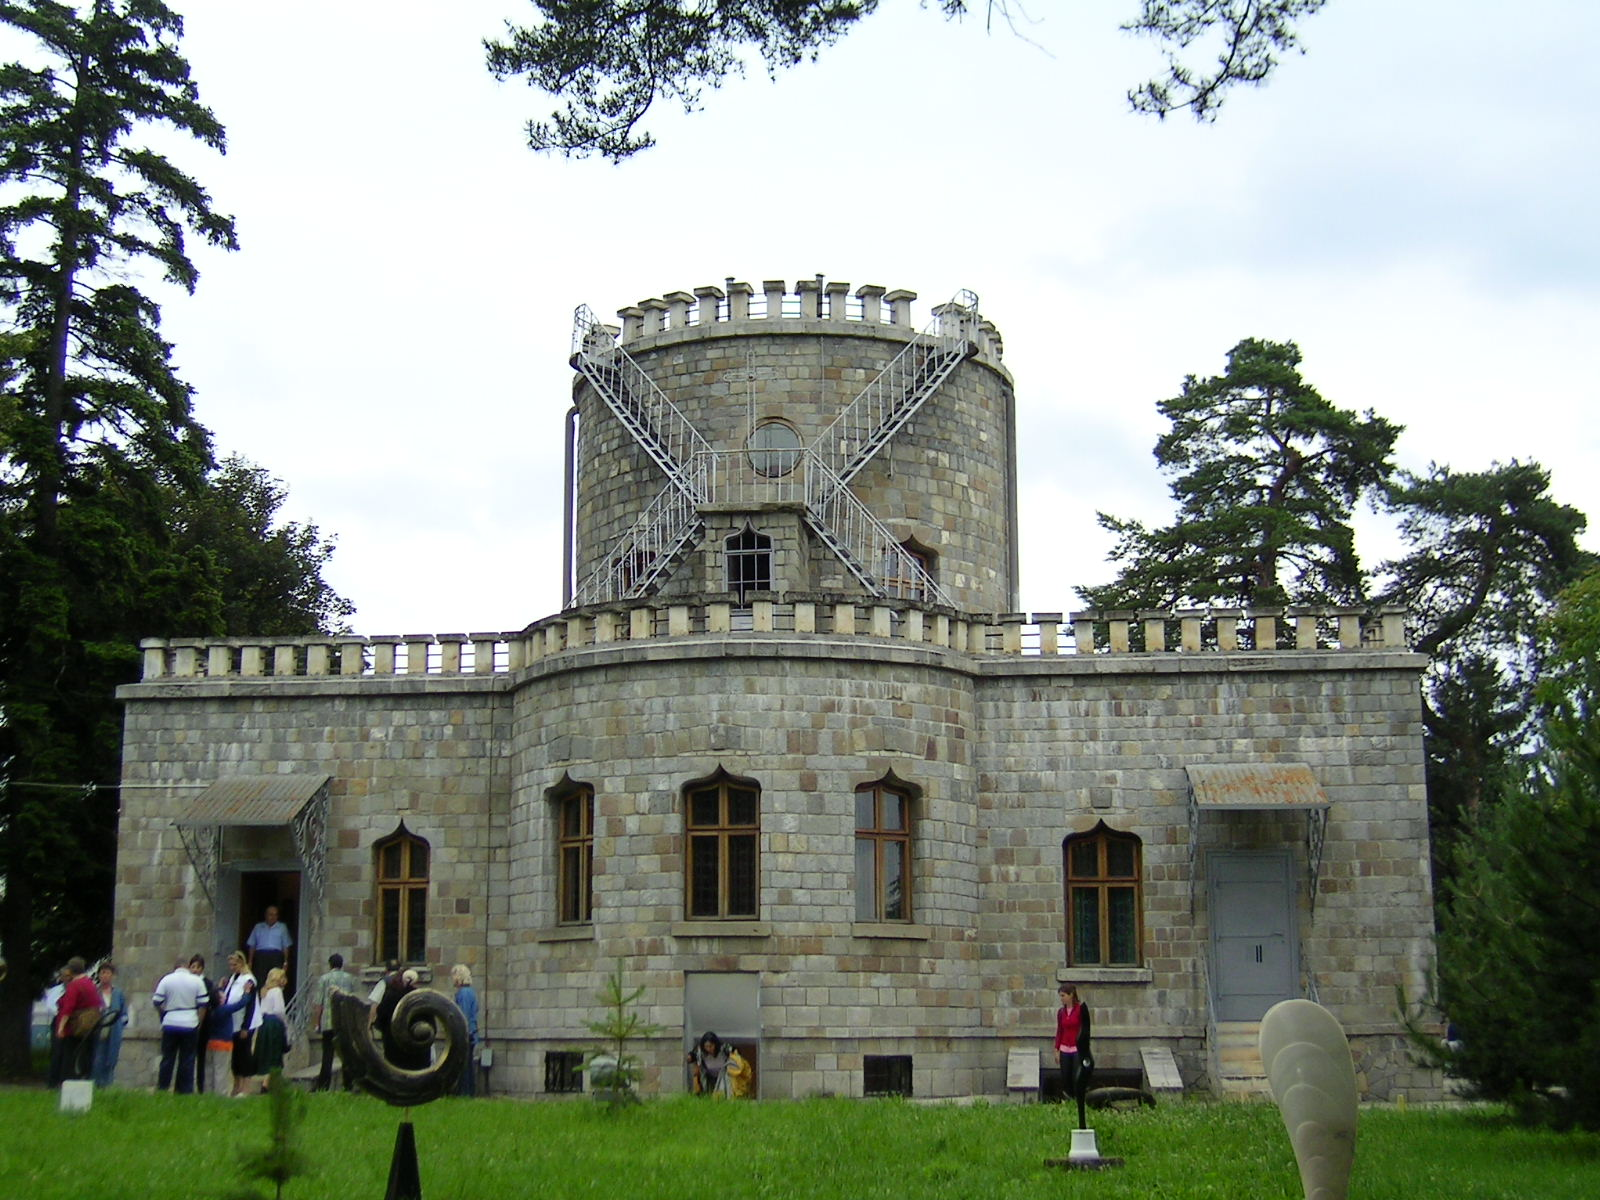 Visiter la Roumanie: Chateau de Iulia Hasdeu à Campina en Valachie